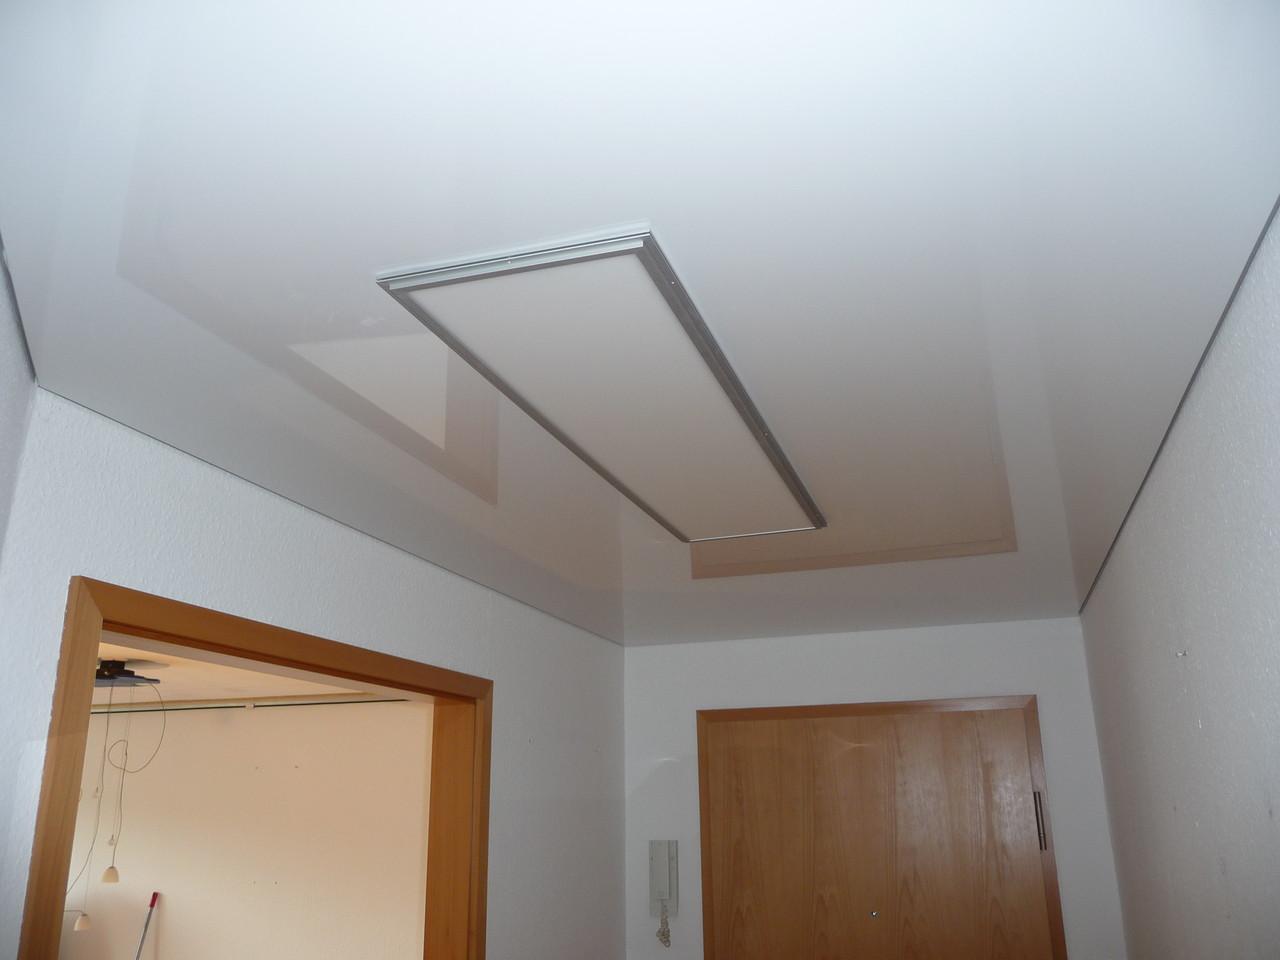 Spannlackdecke mit LED Paneel